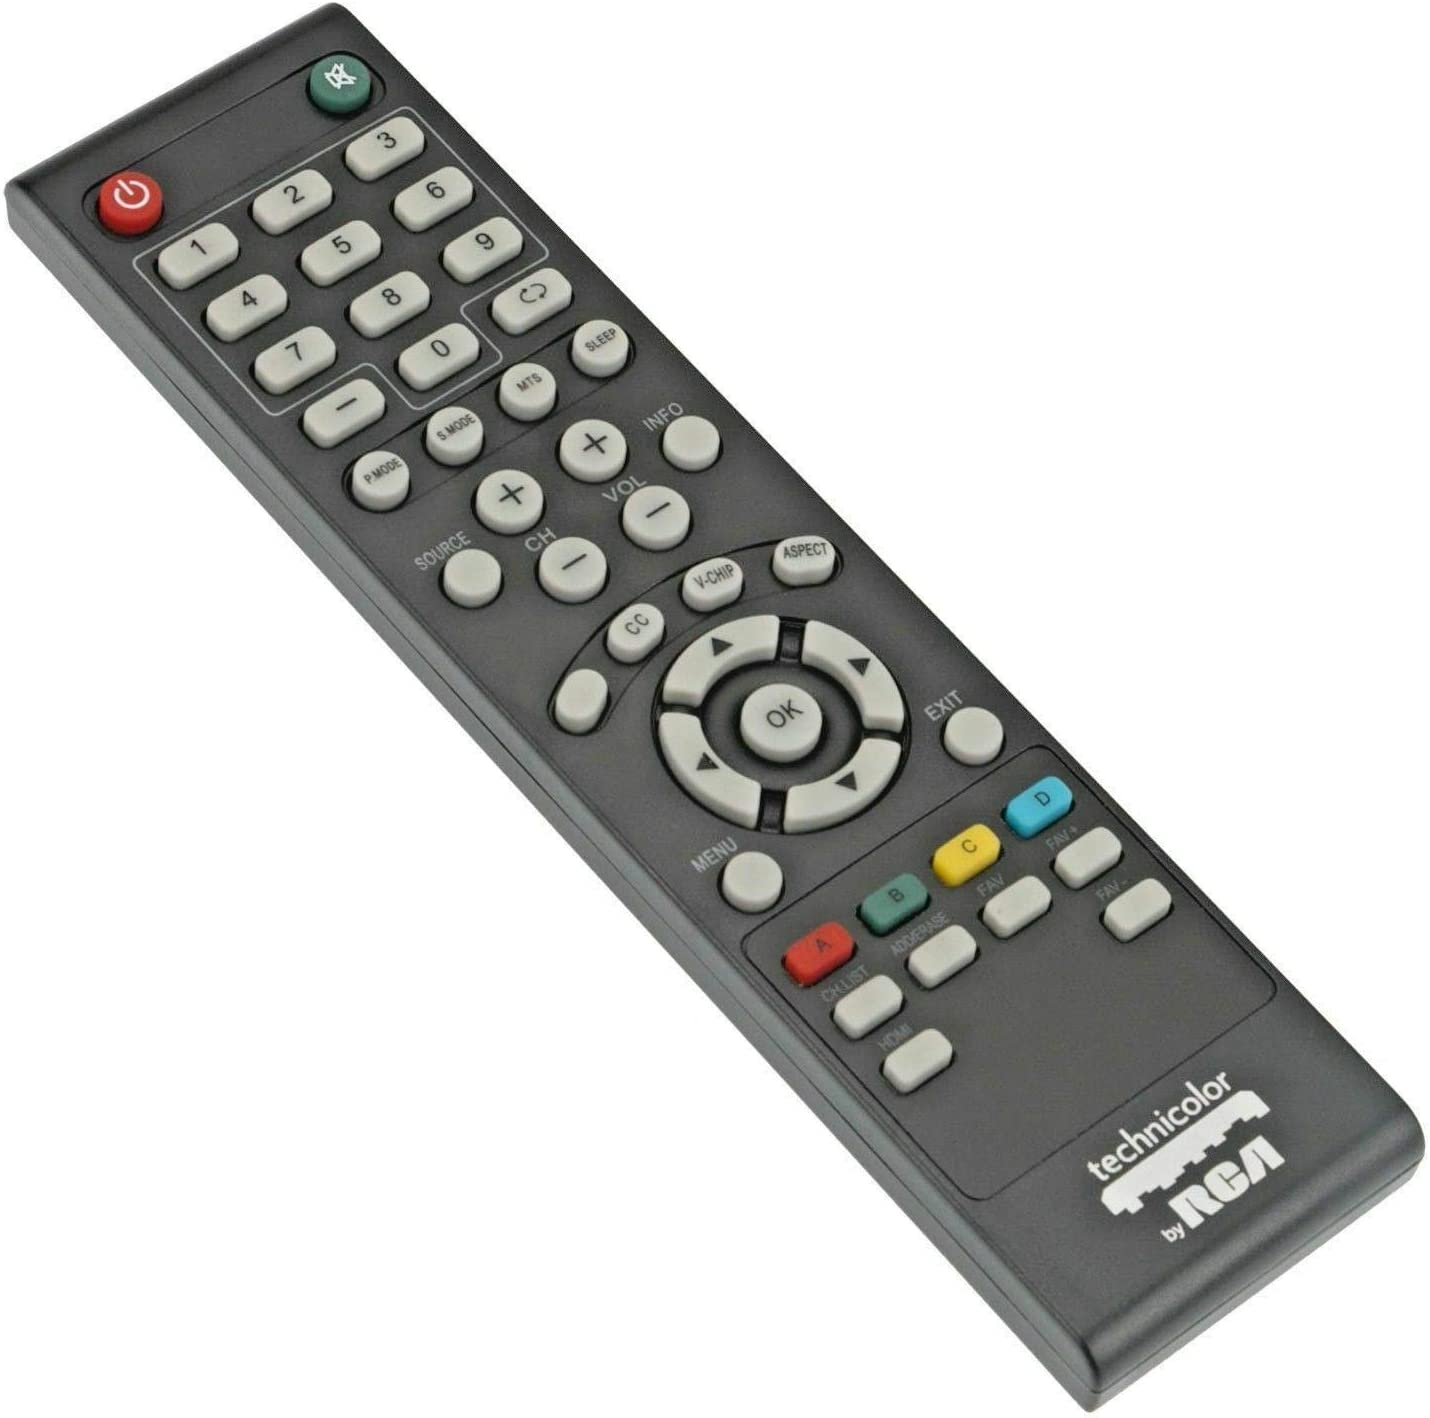 RCA RTU6549-C Remote